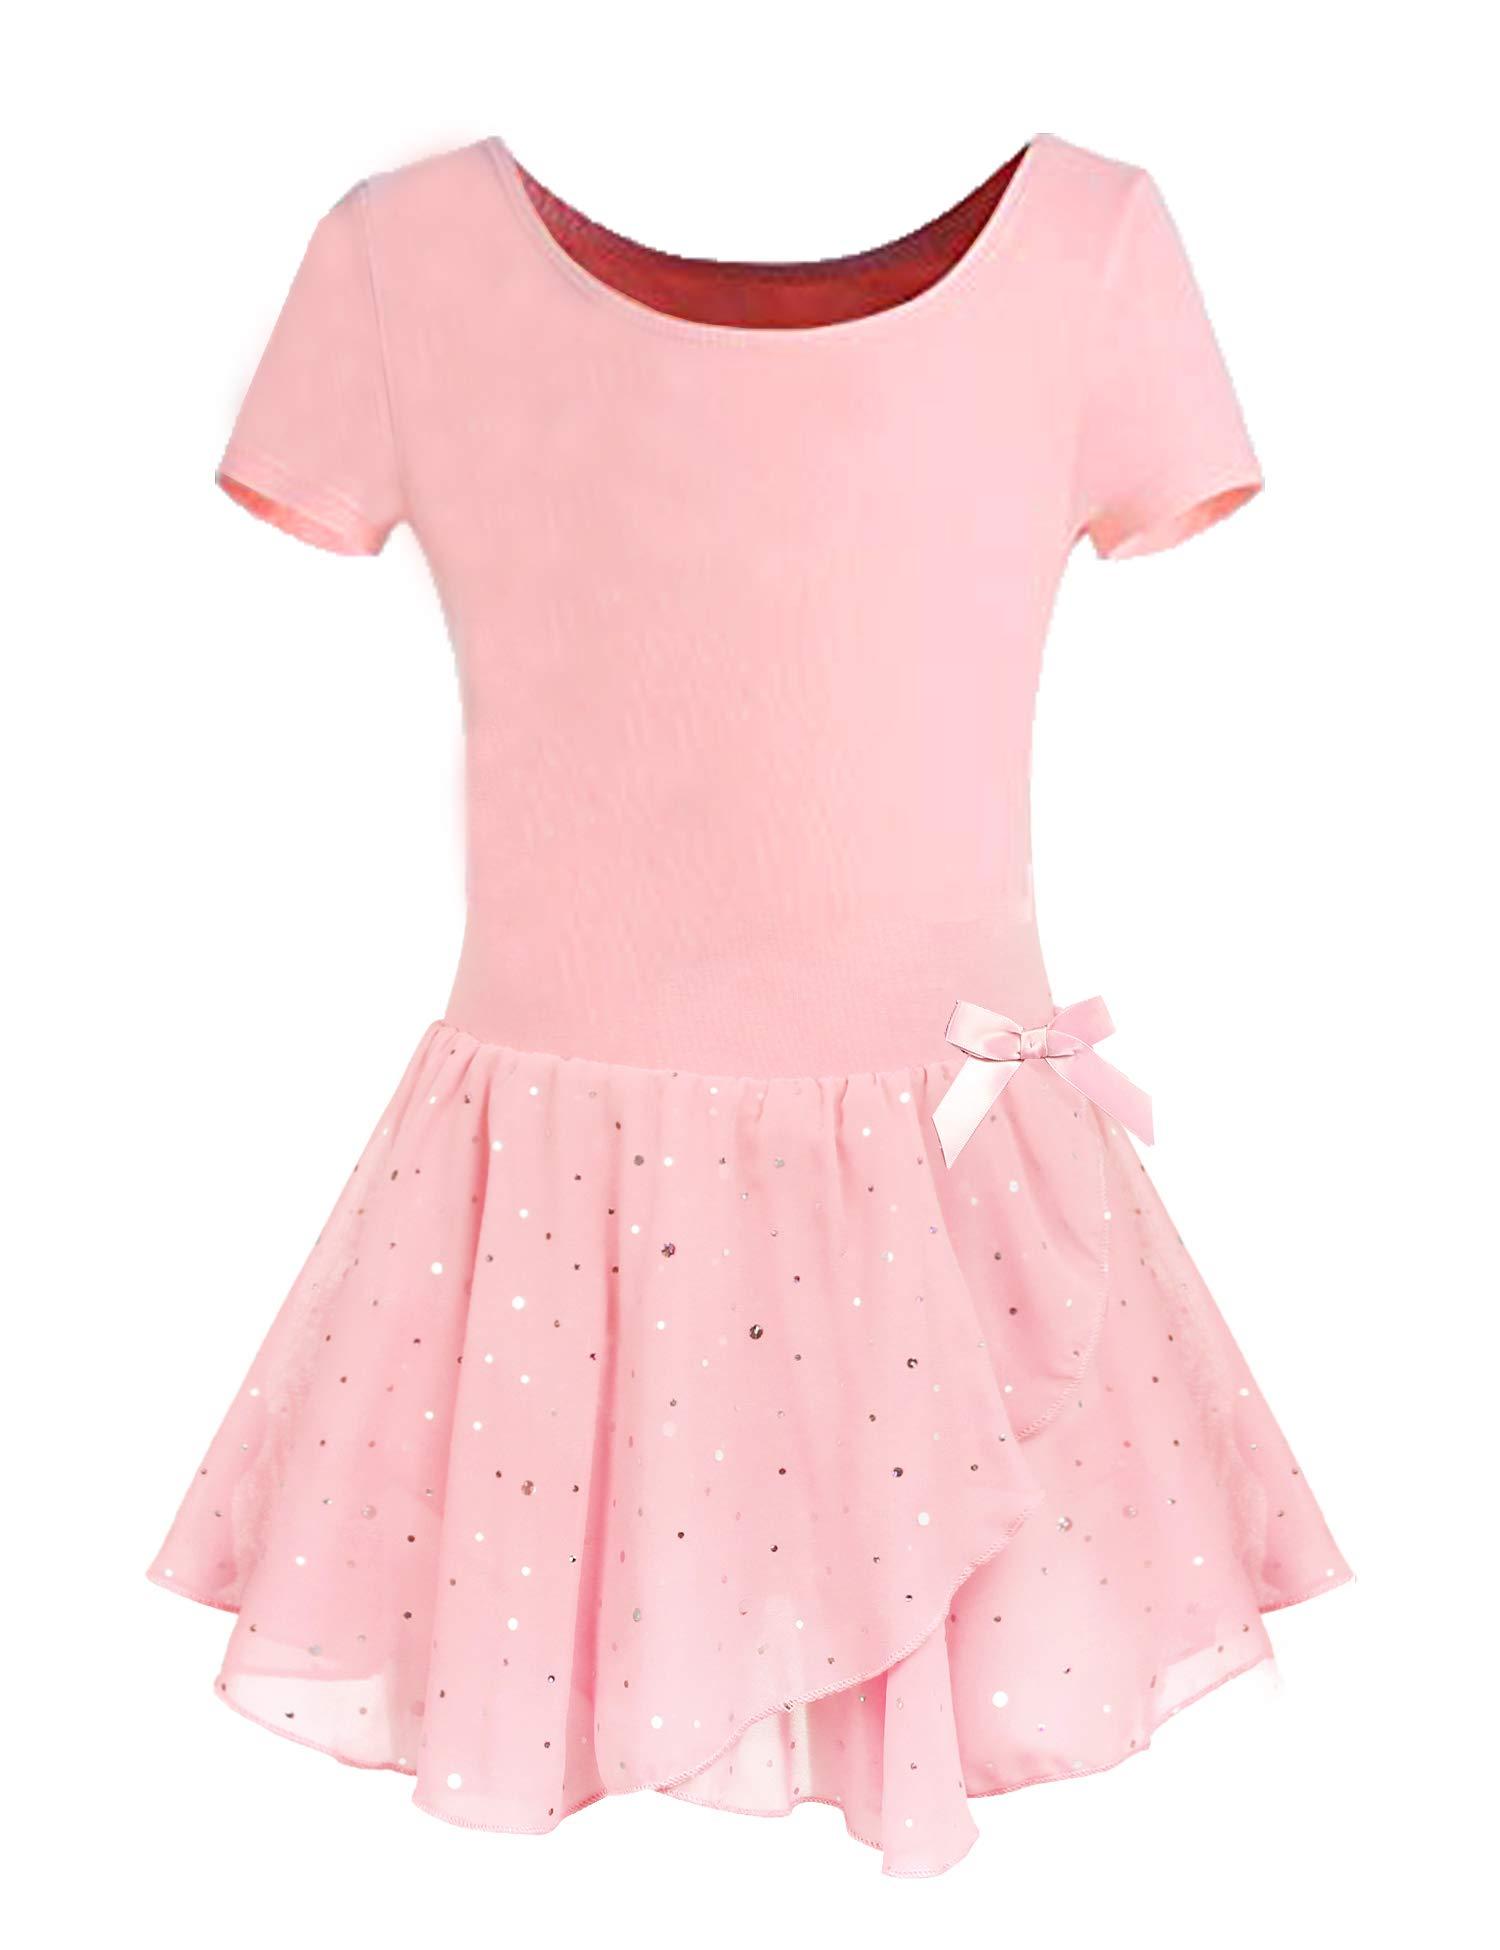 Arshiner Girls Ruffle Sleeve Ballet Dance Dress With Tutu Skirt Leotards Spark Ballet Pink 140 Age For 6 7y